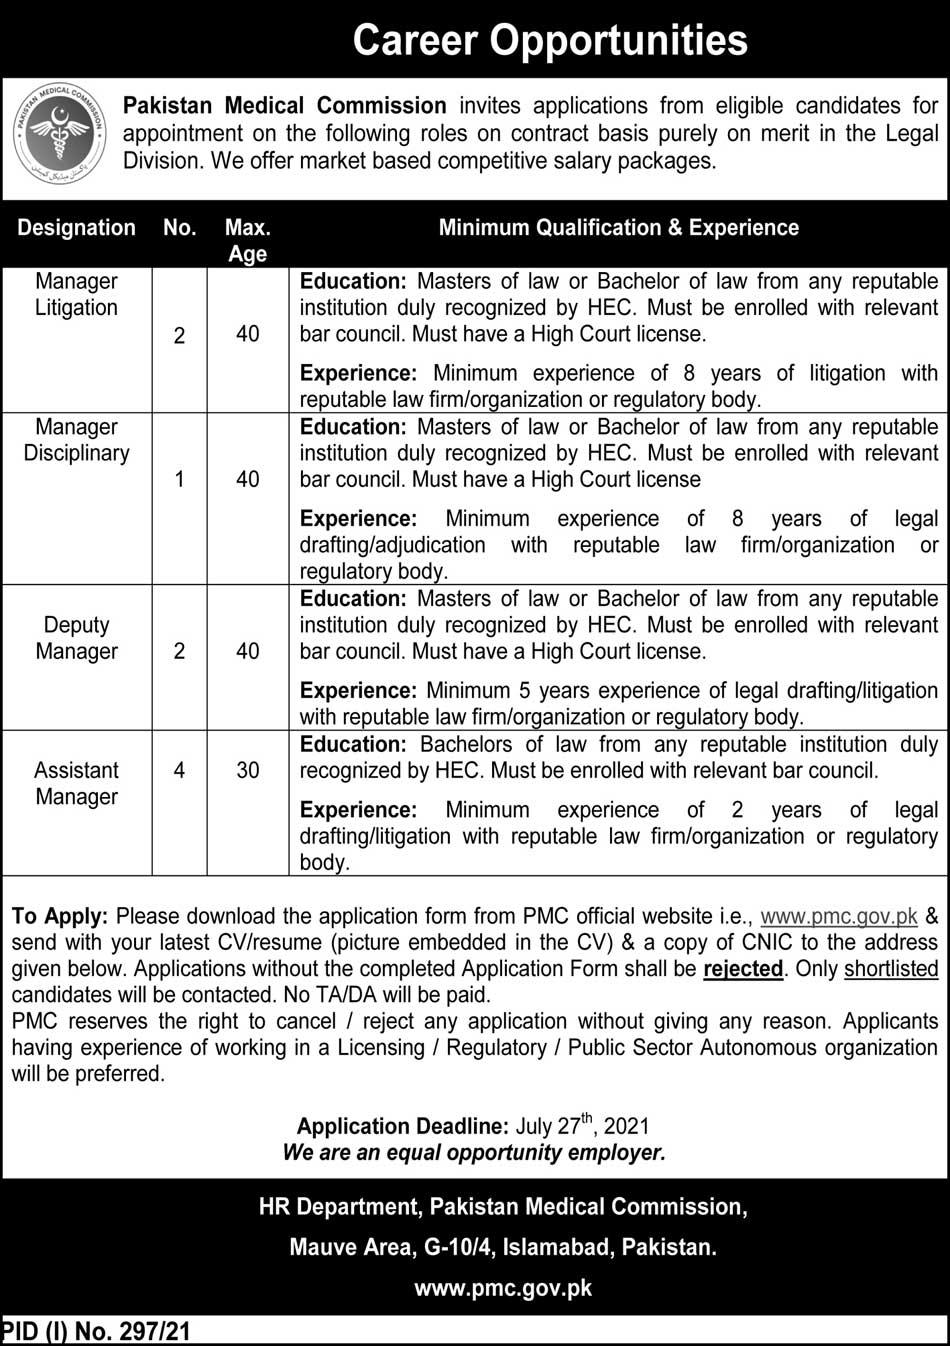 PMC Pakistan Medical Commission Islamabad Jobs 2021 pmc.gov.pk